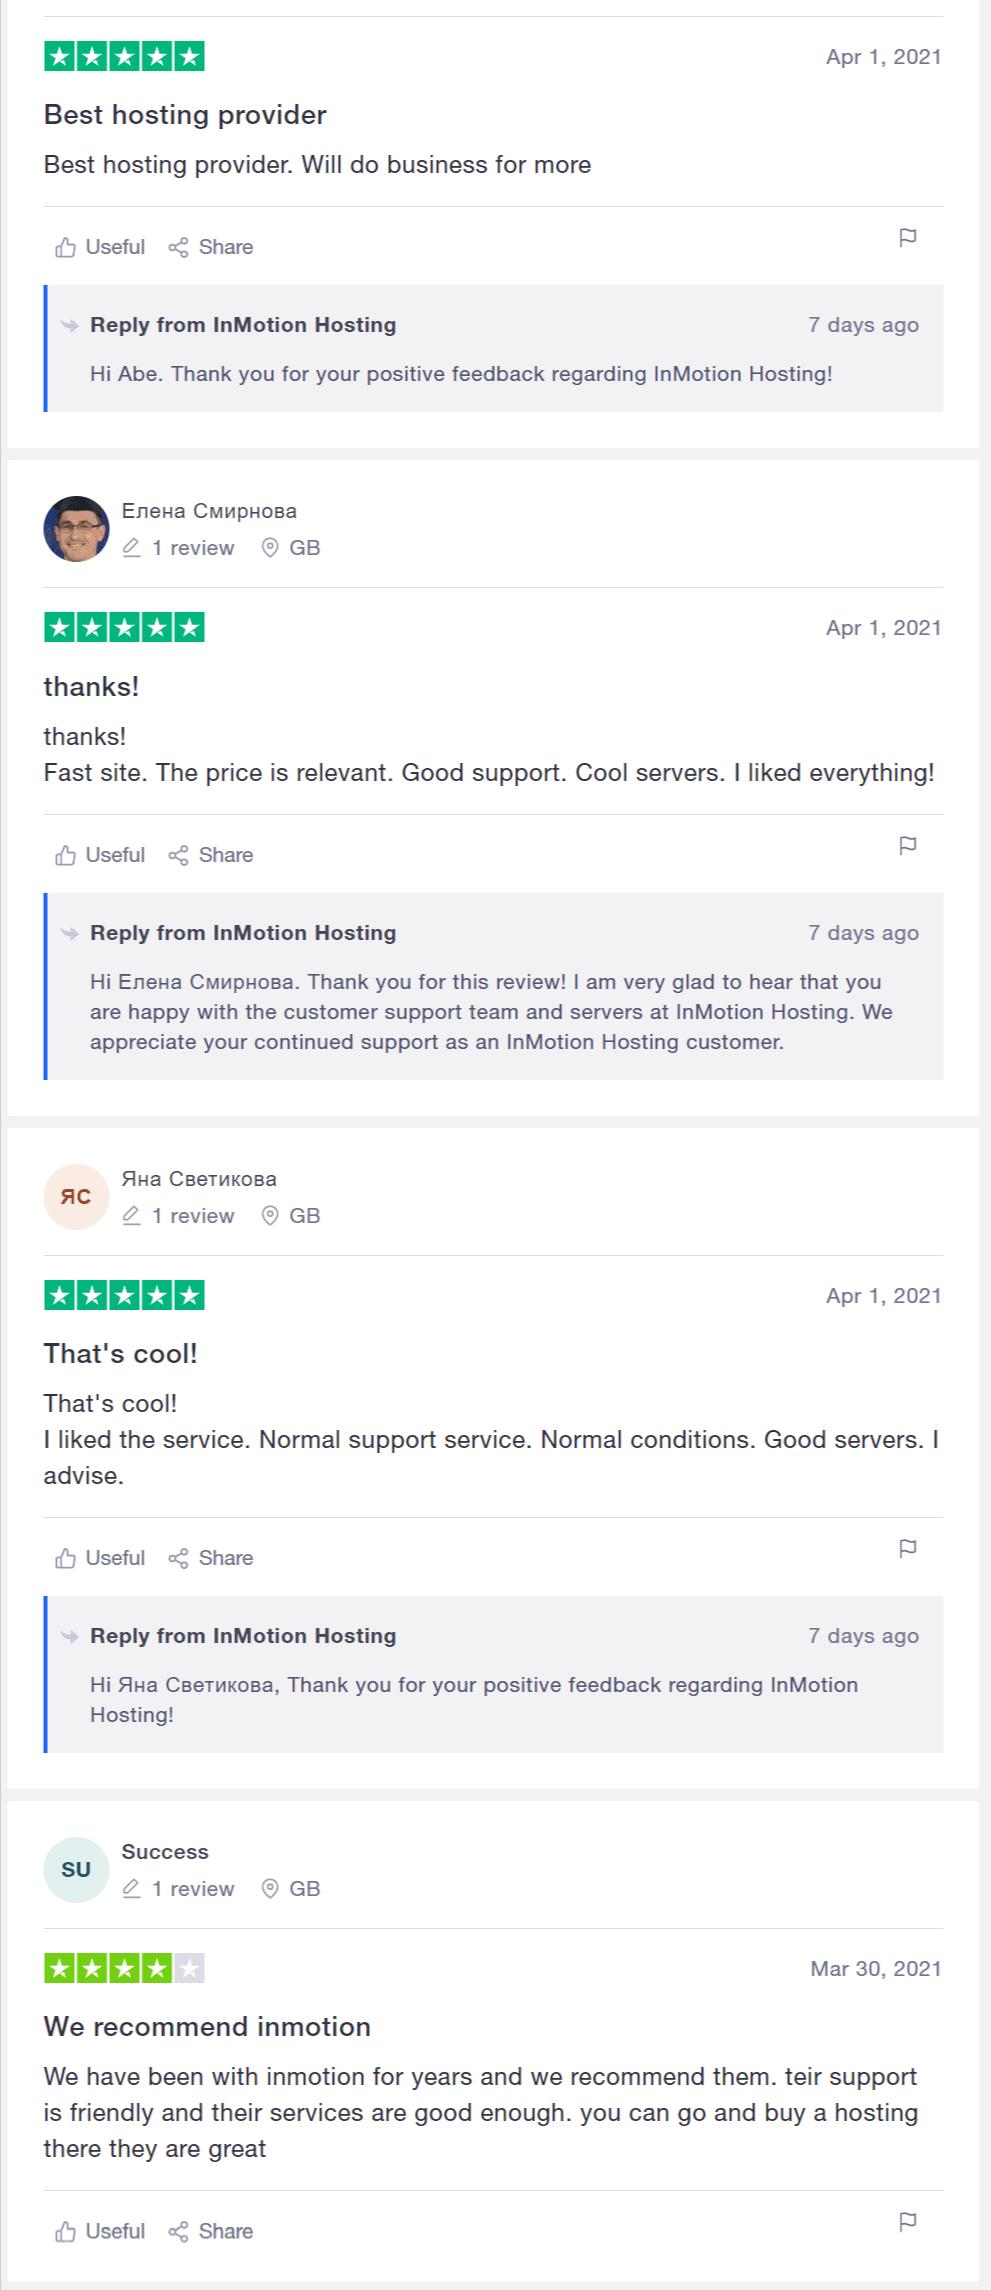 InMotion-Hosting-Reviews-Read-Customer-Service-Reviews-of-www-inmotionhosting-com (1)